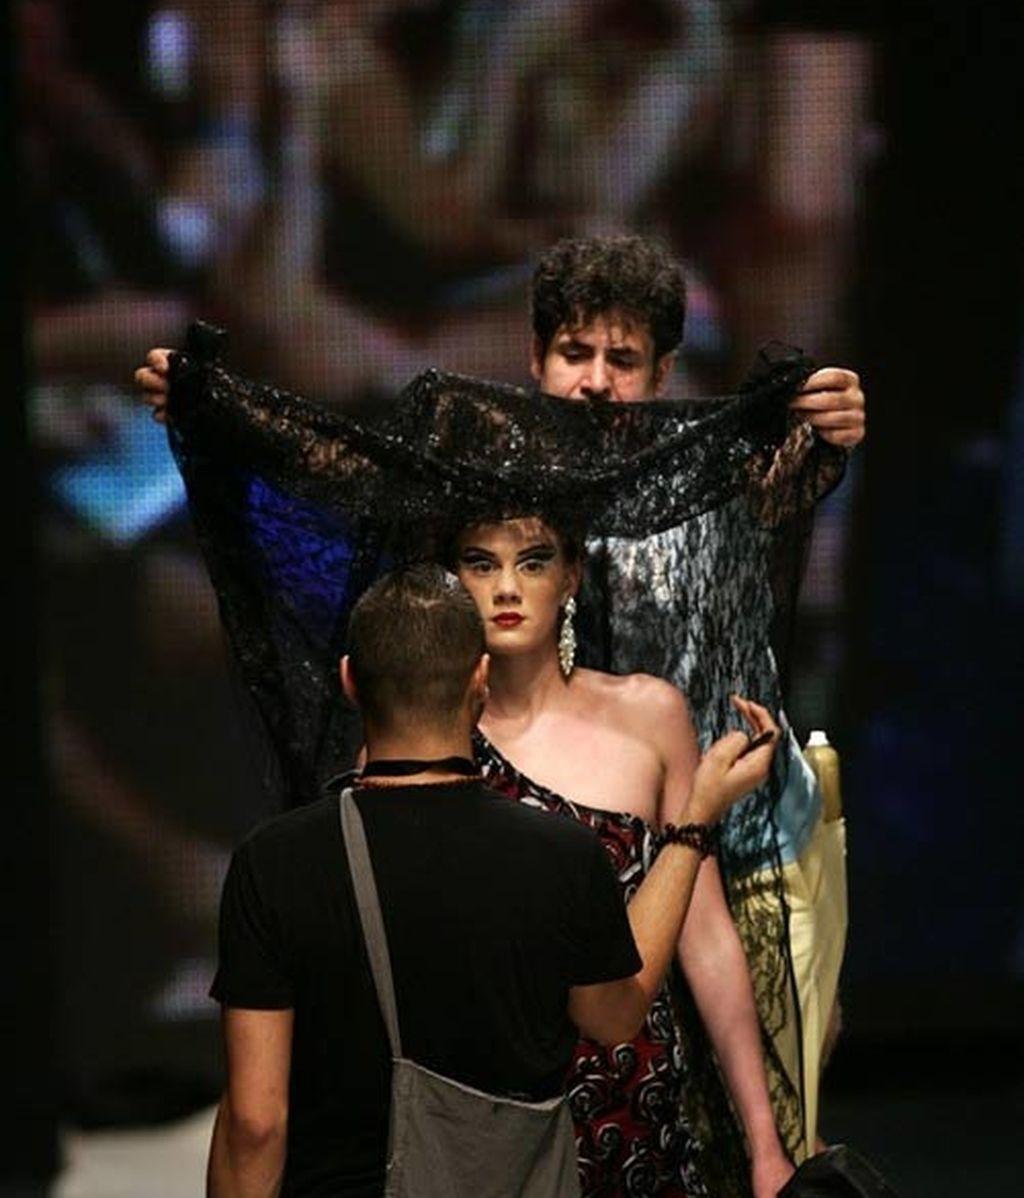 República Dominicana Fashion Week 2009